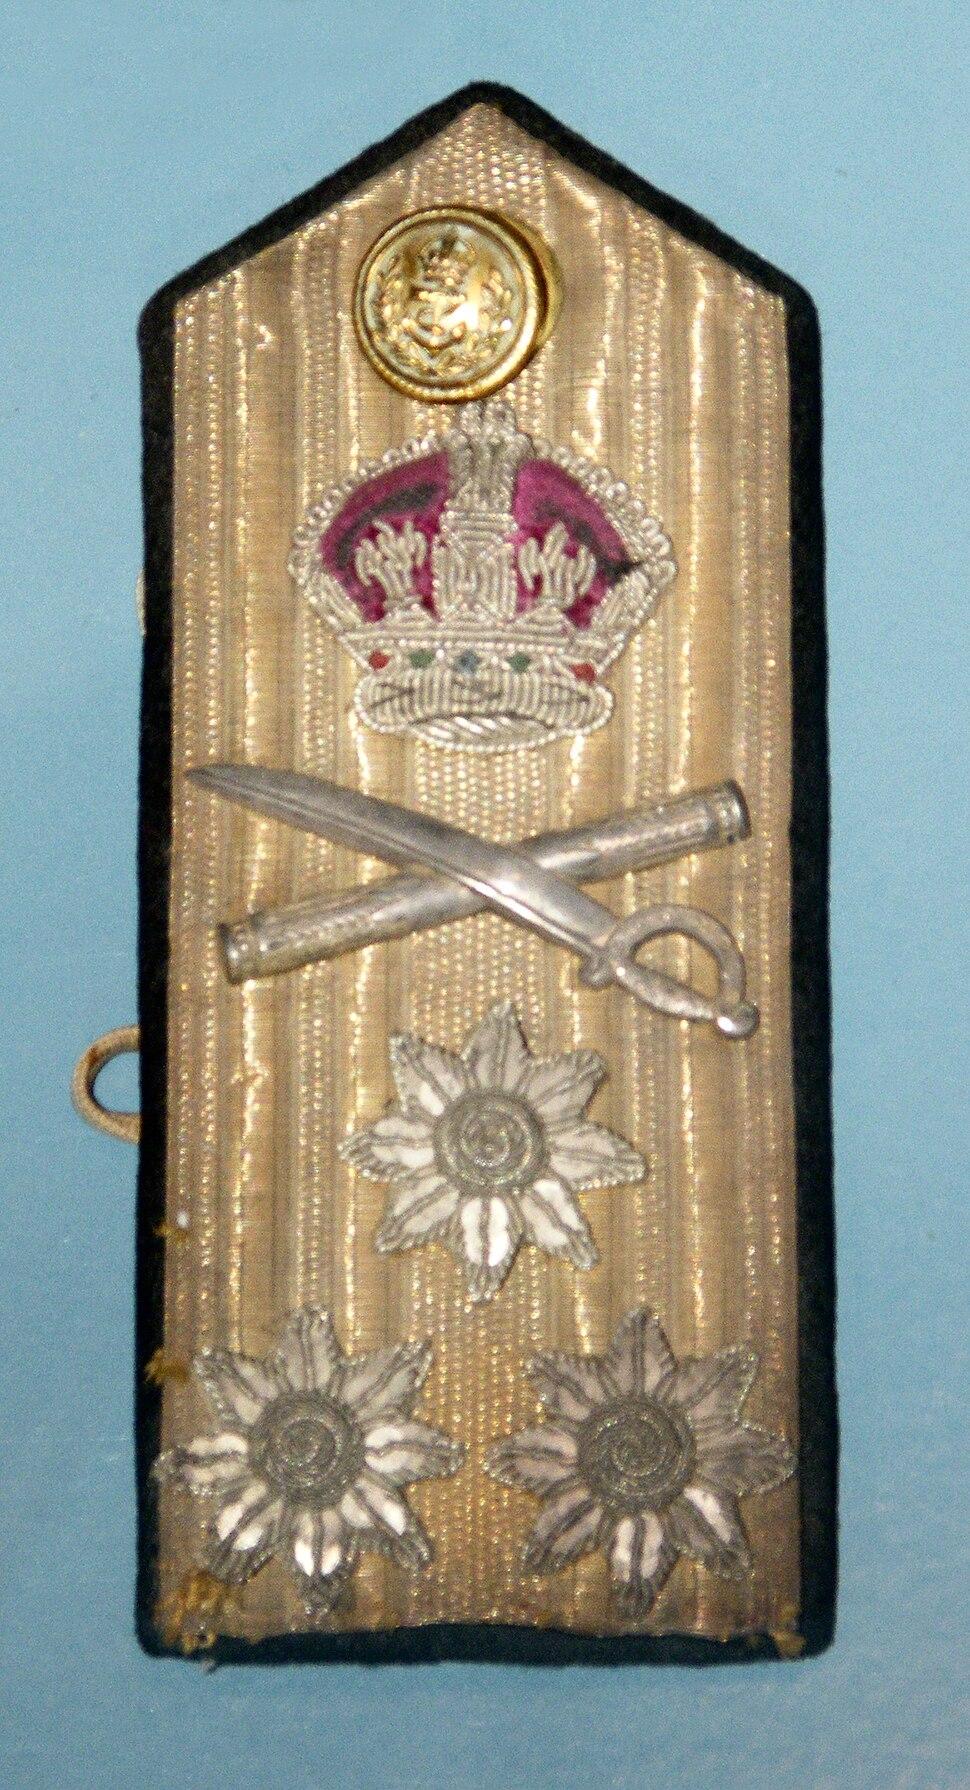 World War II Royal Navy admiral's shoulder board